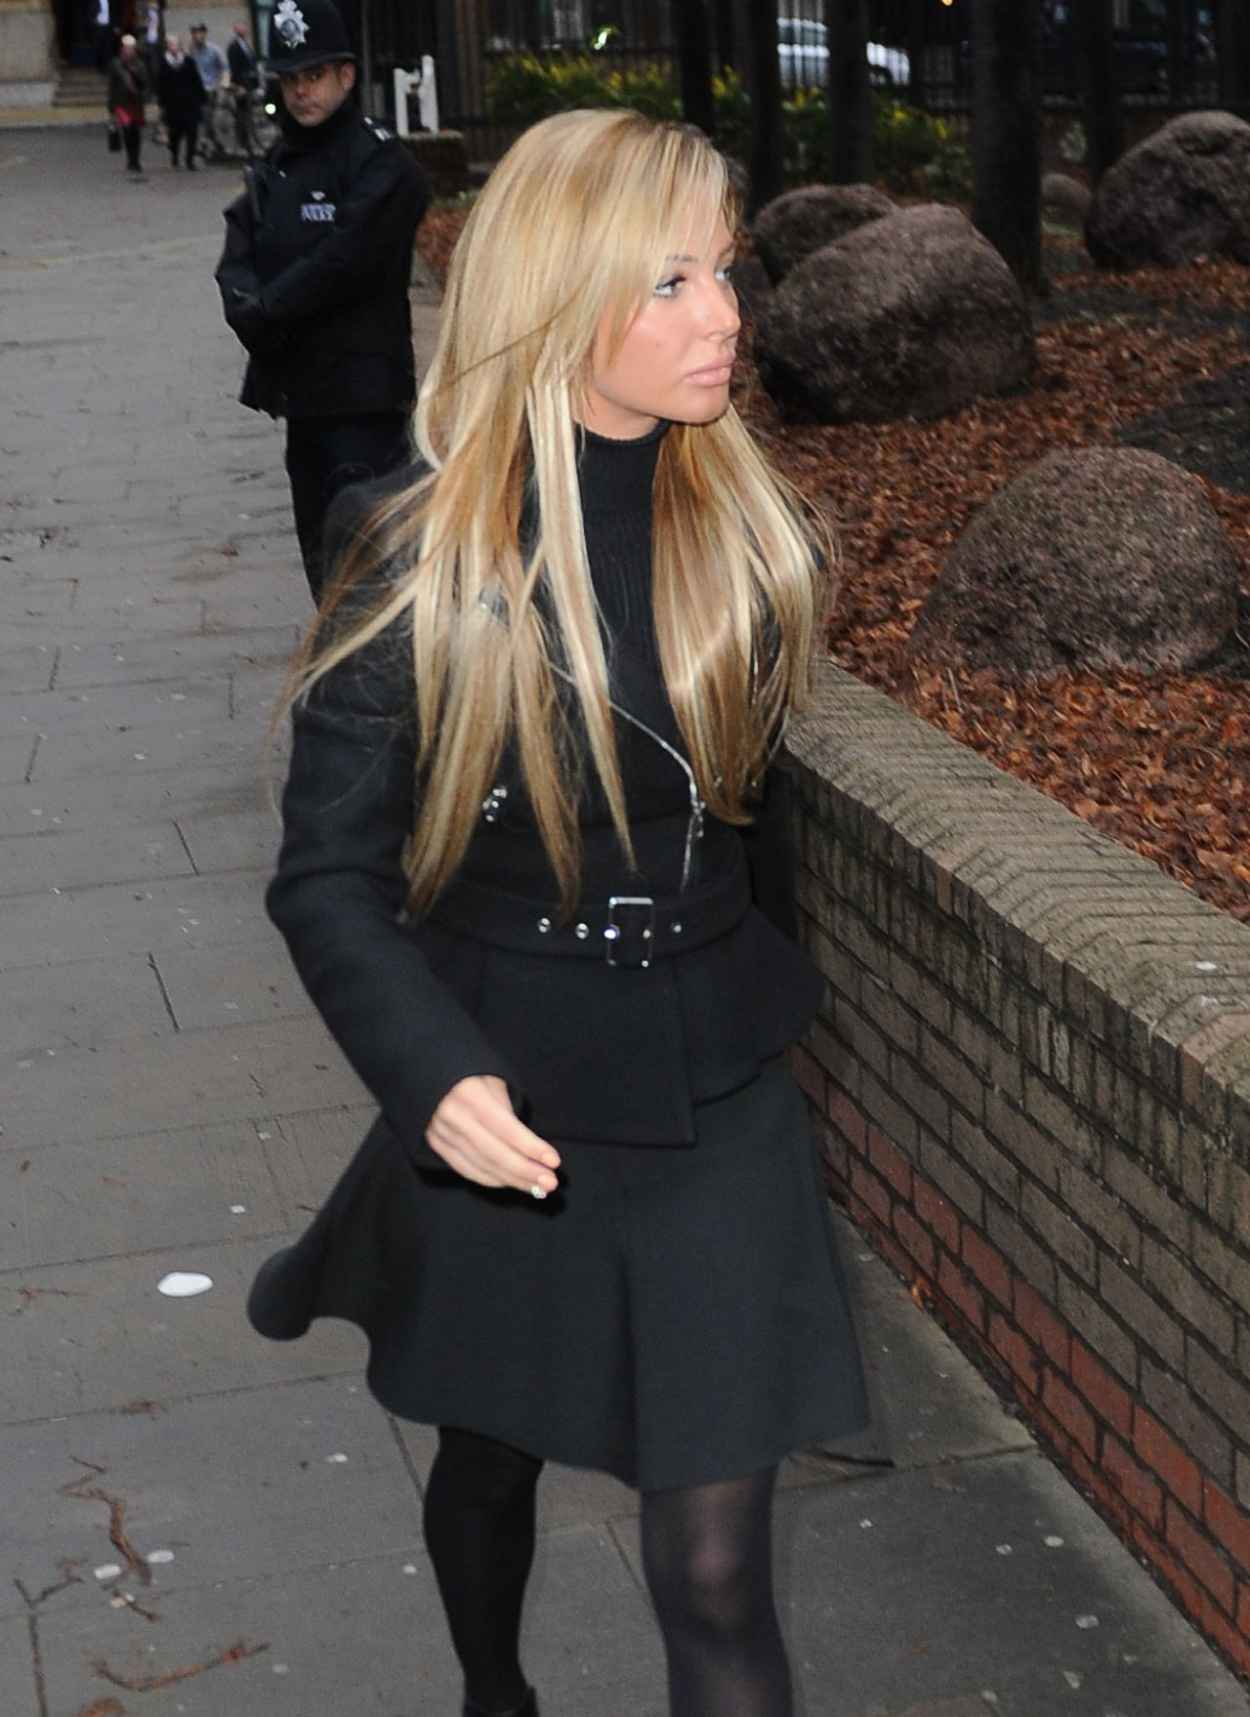 Tulisa Contostavlos Arrives at Southwark Crown Court - United Kingdom January 9, 2015-1